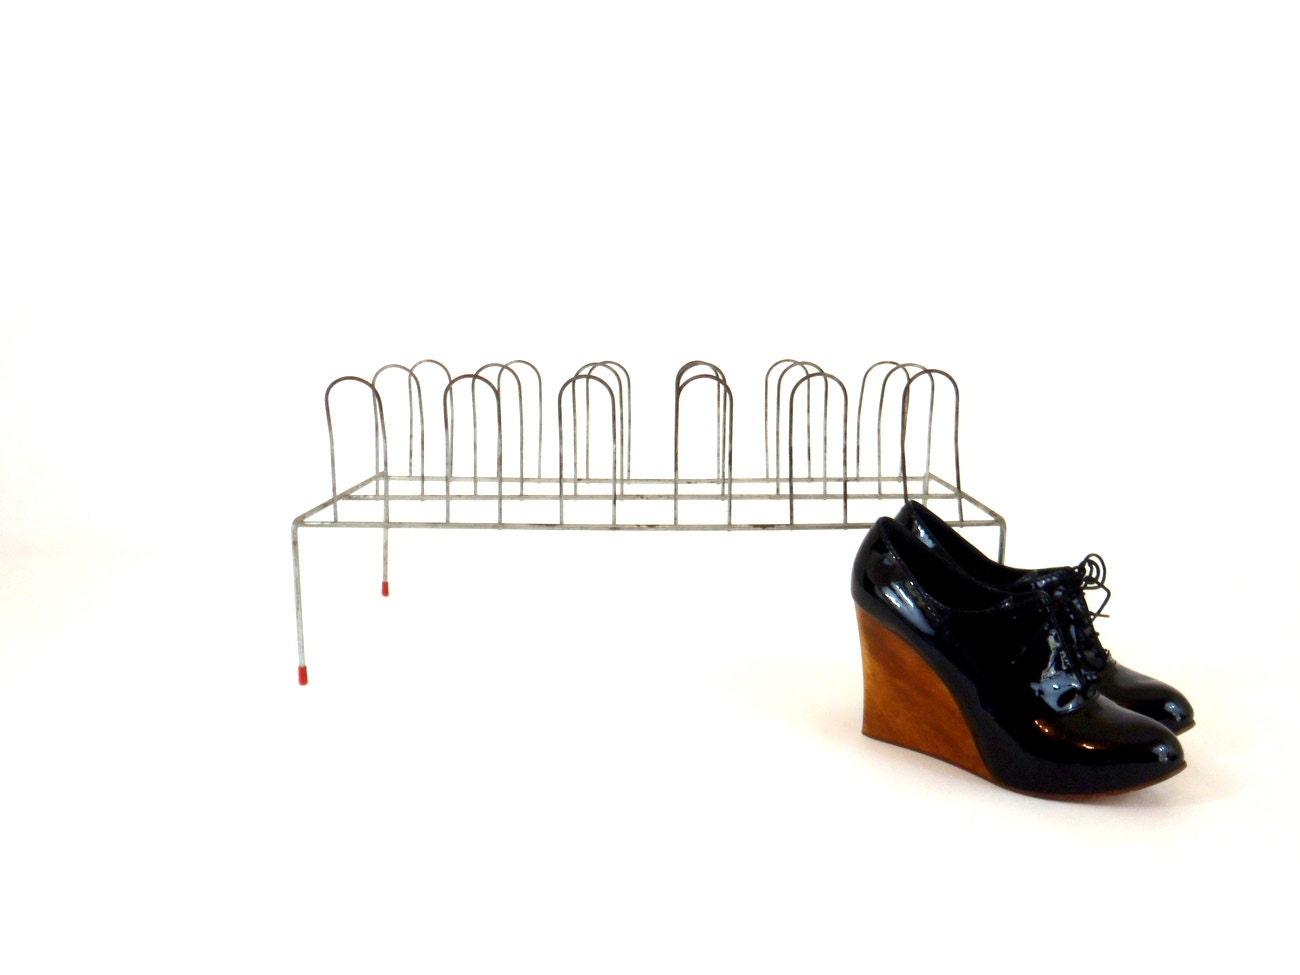 Closet Organizer Shoe Rack Metal Shoe Stand Vintage By Honestjunk